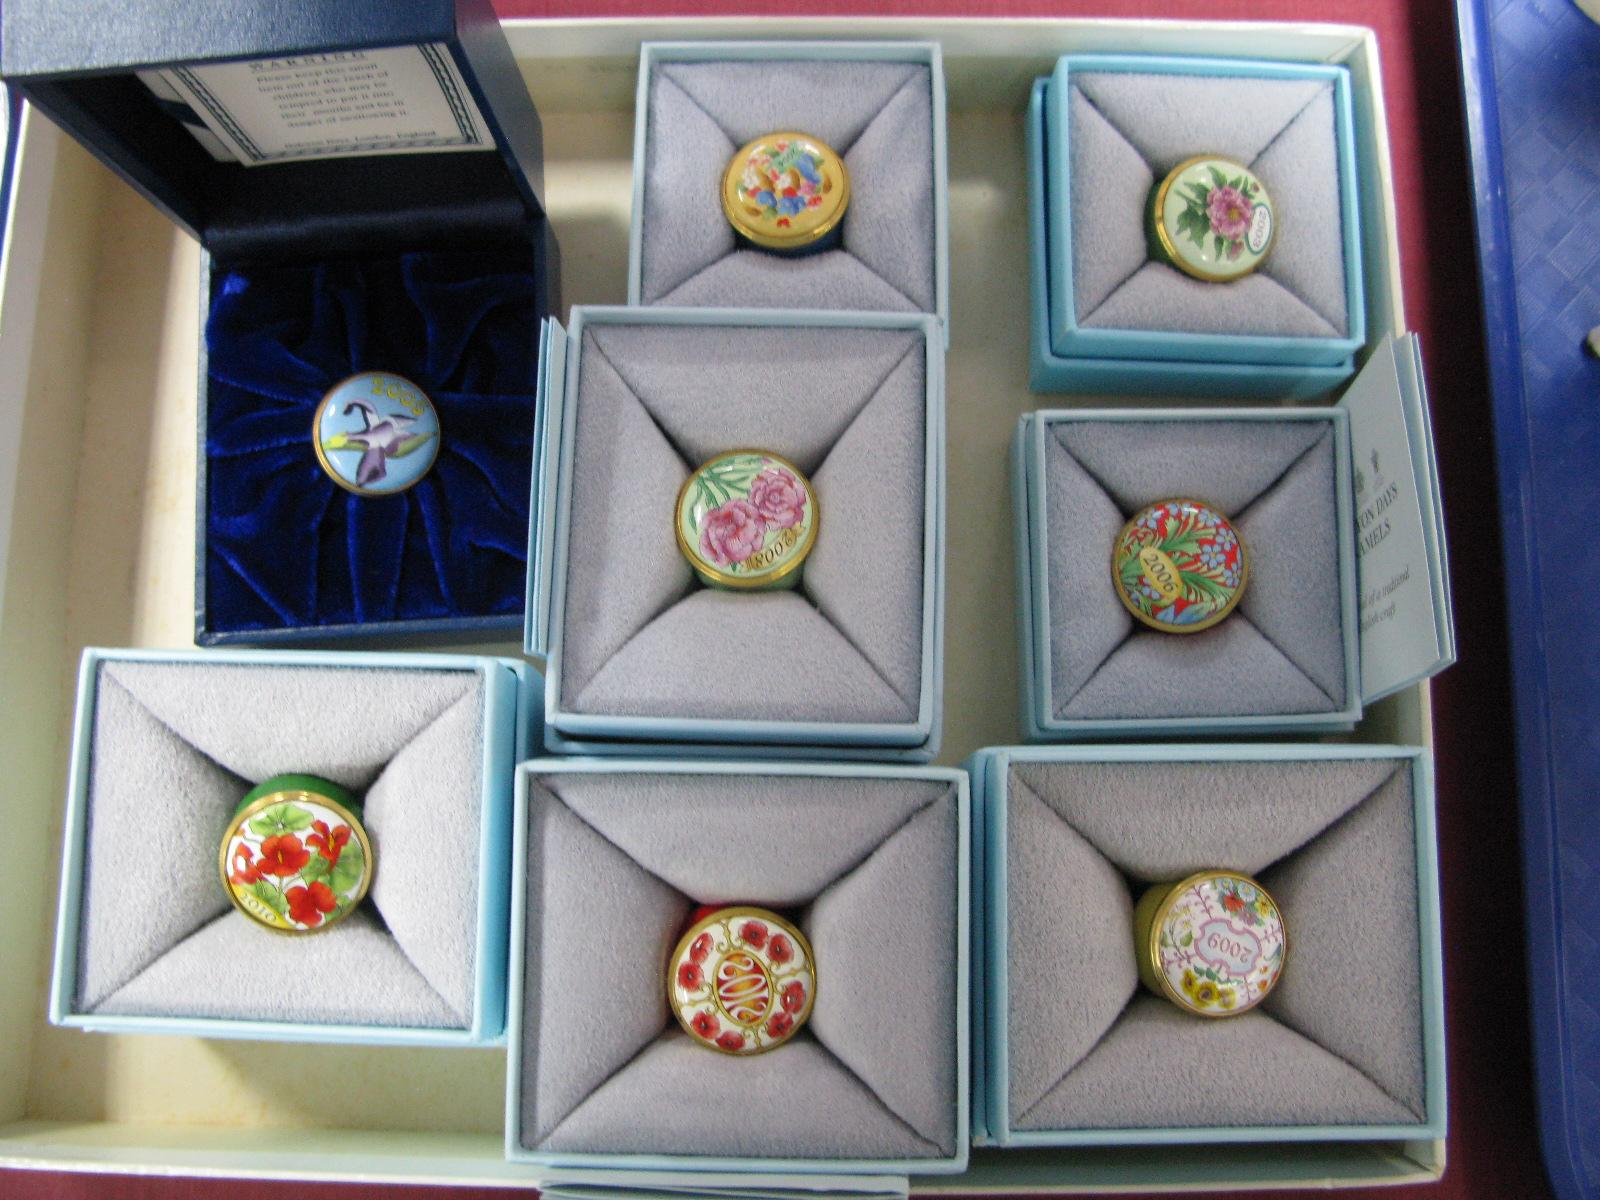 Lot 61 - Eight Halcyon Days Circular Enamel 'Year' Trinket Pots, 2003, 2004, 2005, 2006, 2008, 2009, 2010 and